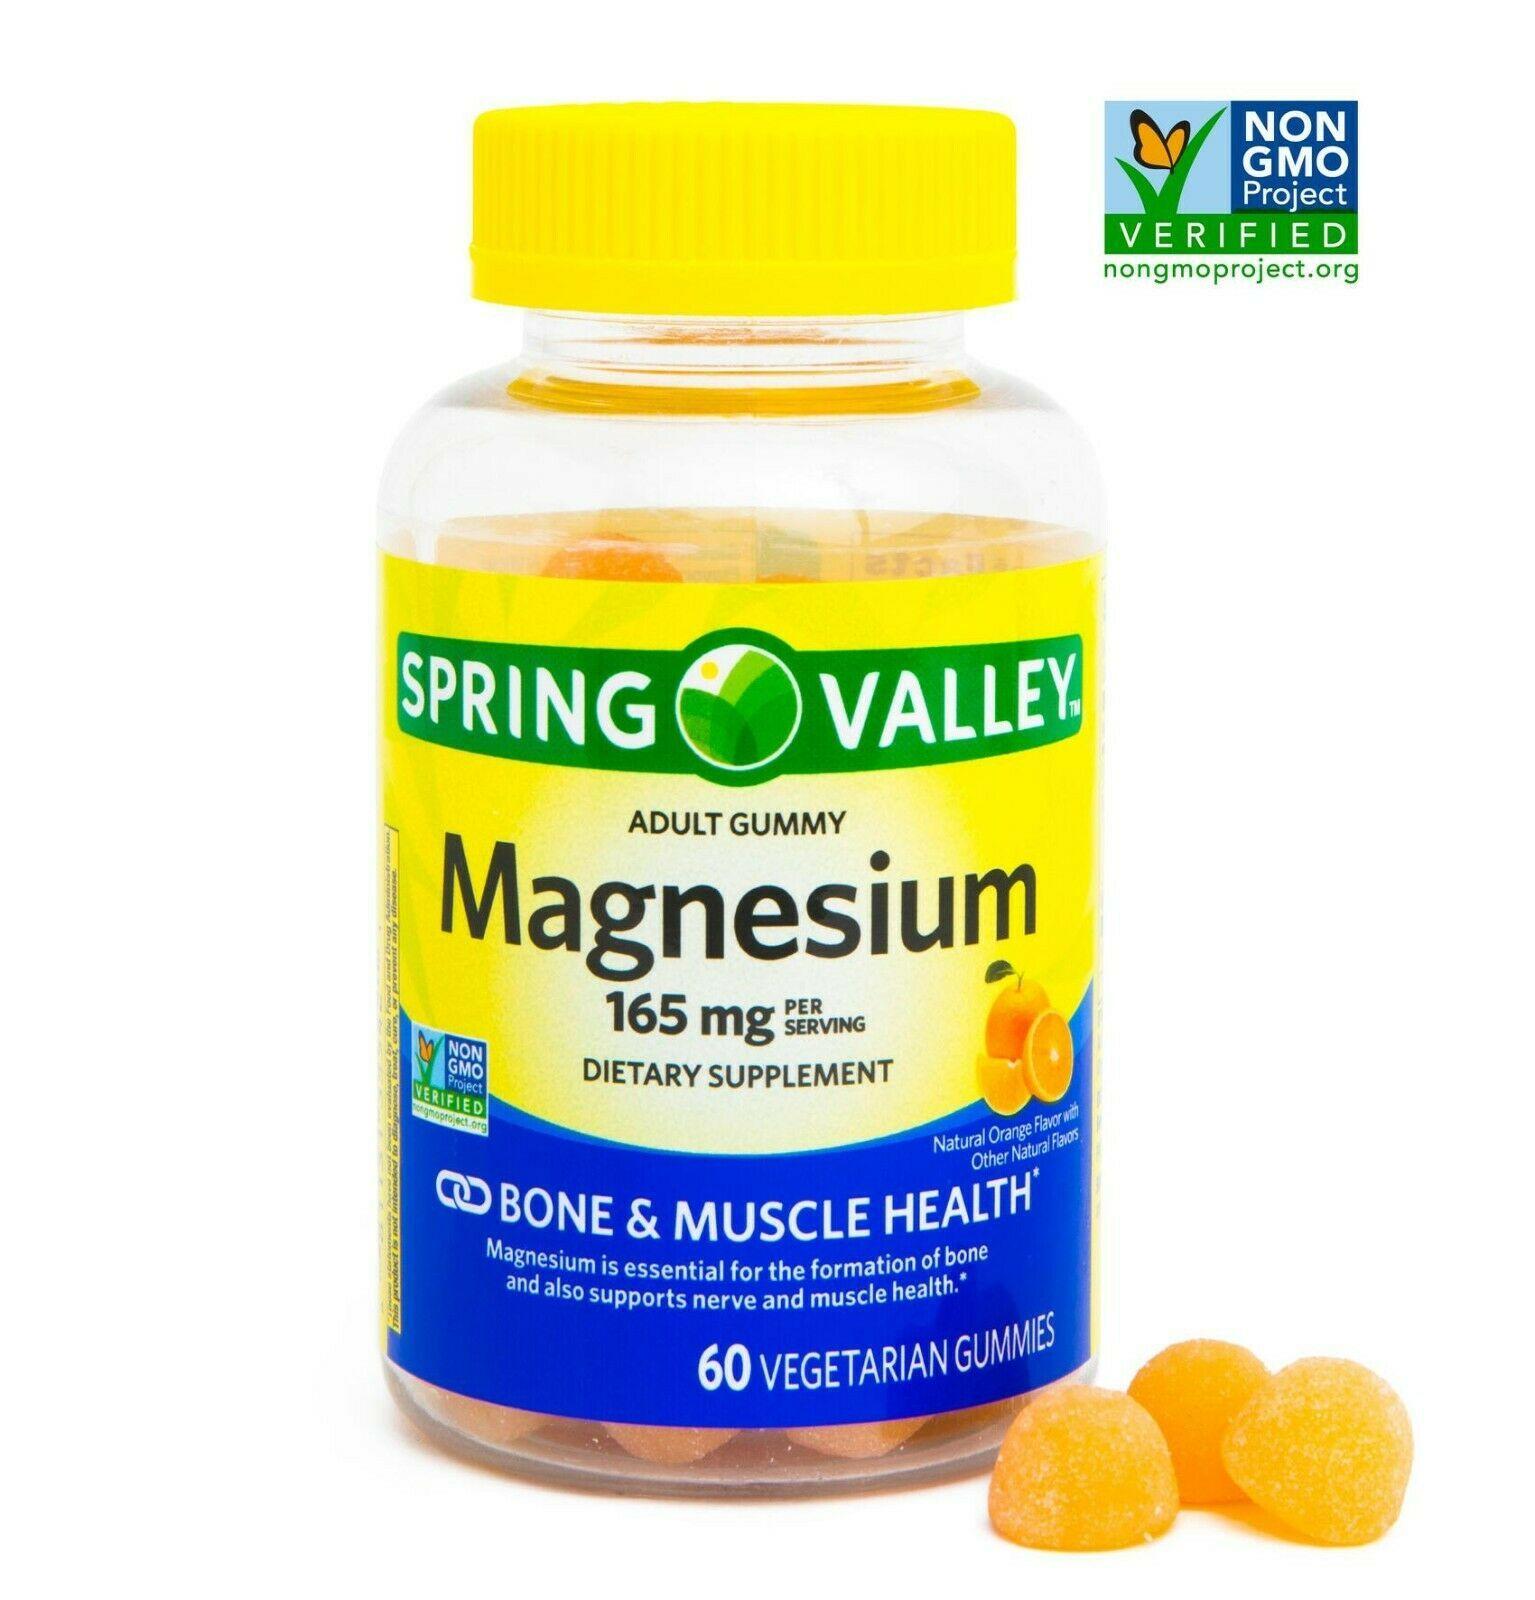 Spring Valley Sv Magnesium 165 mg Vegetarian Gummies 60 count.. - $25.99